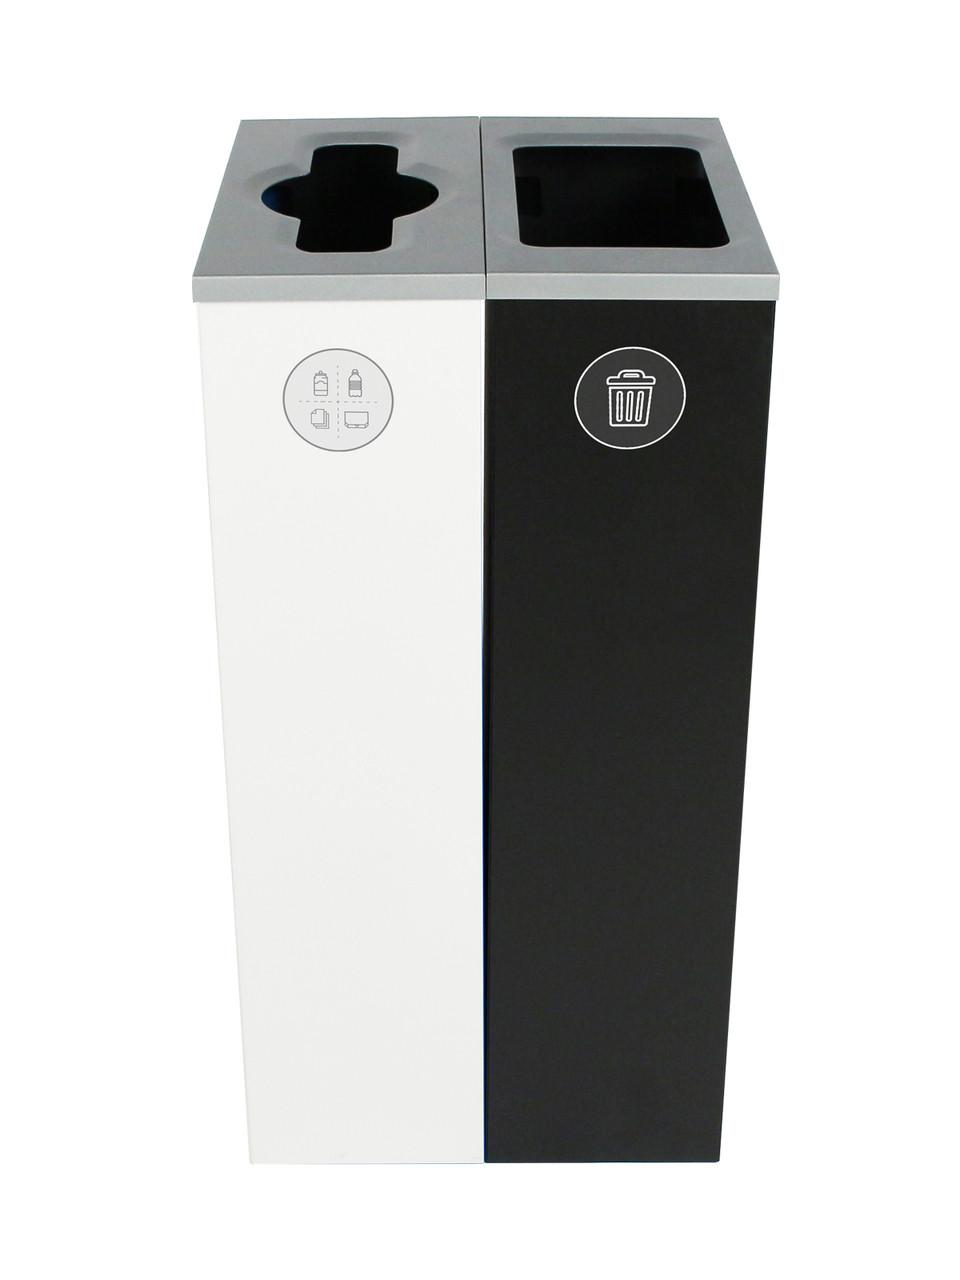 20 Gallon Spectrum Slim Dual Trash Can & Recycle Bin White/Black 8107097-24